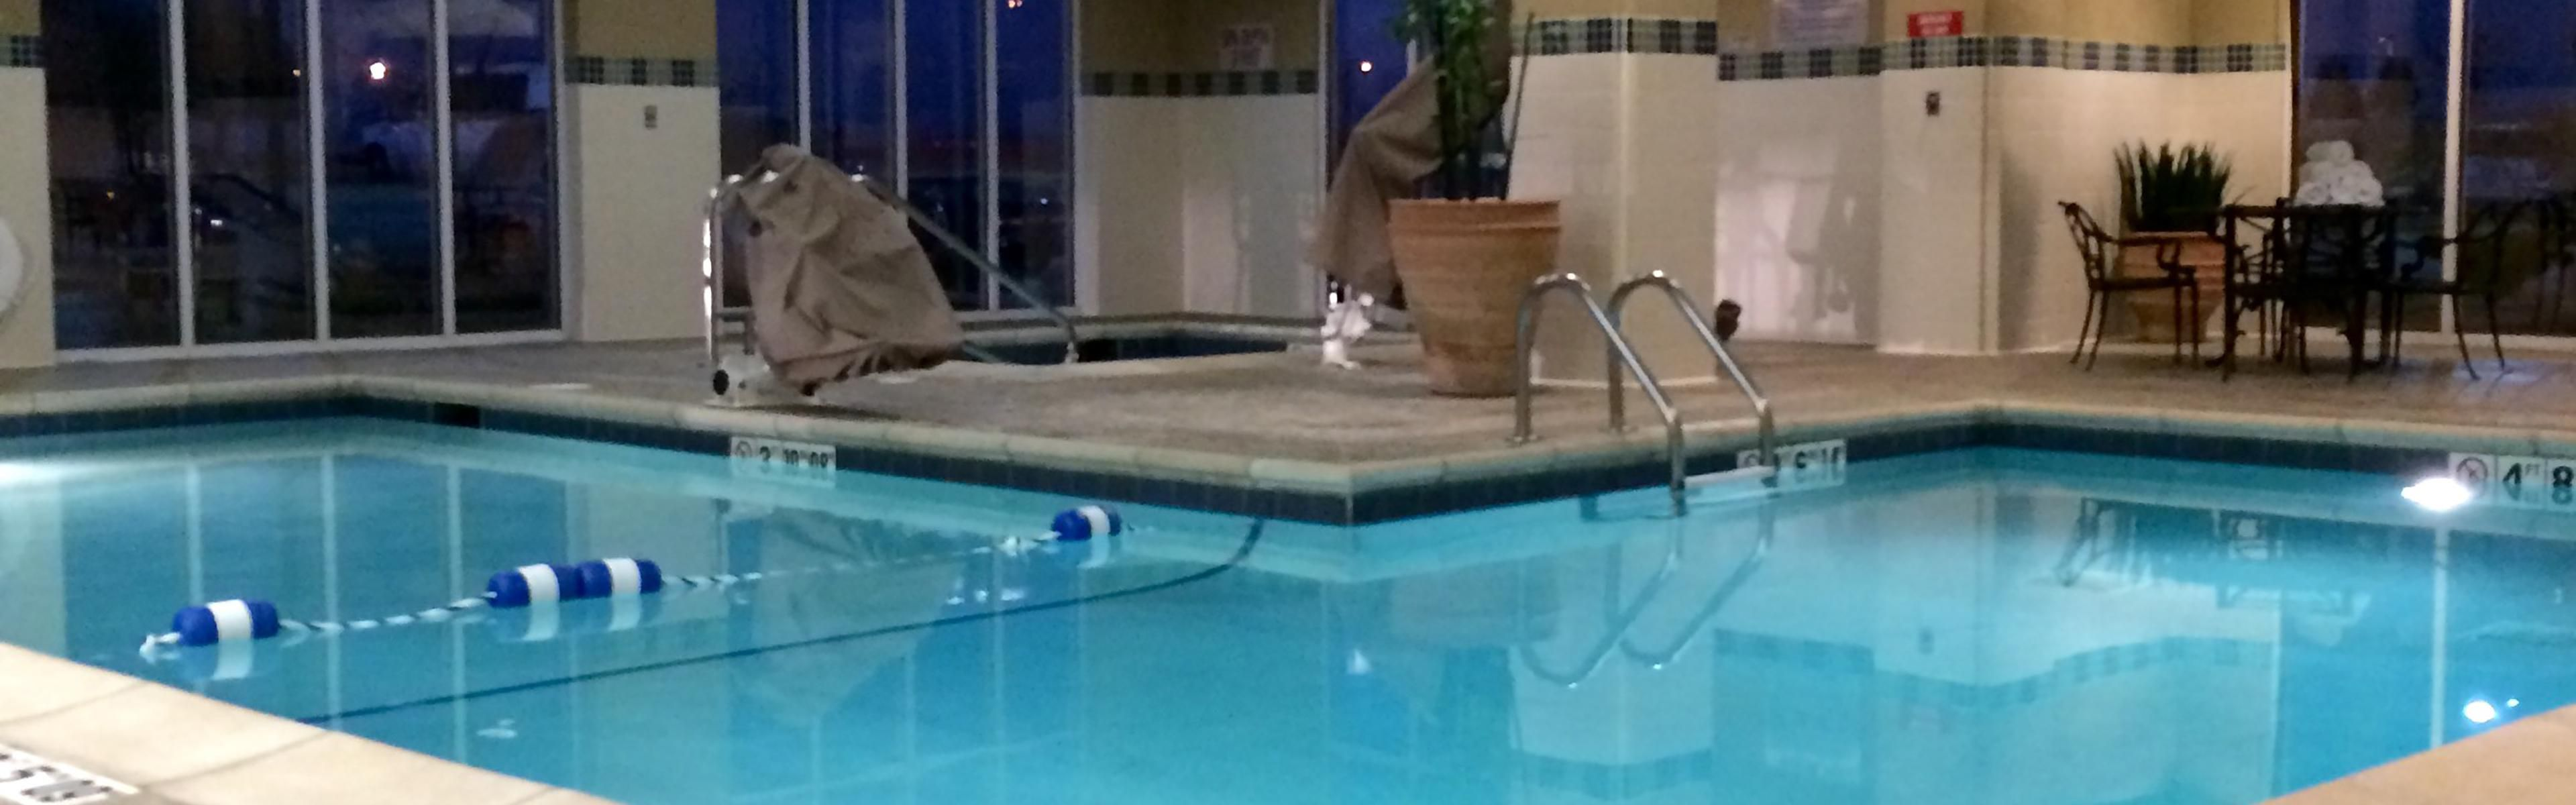 Holiday Inn & Suites West Des Moines-Jordan Creek image 2